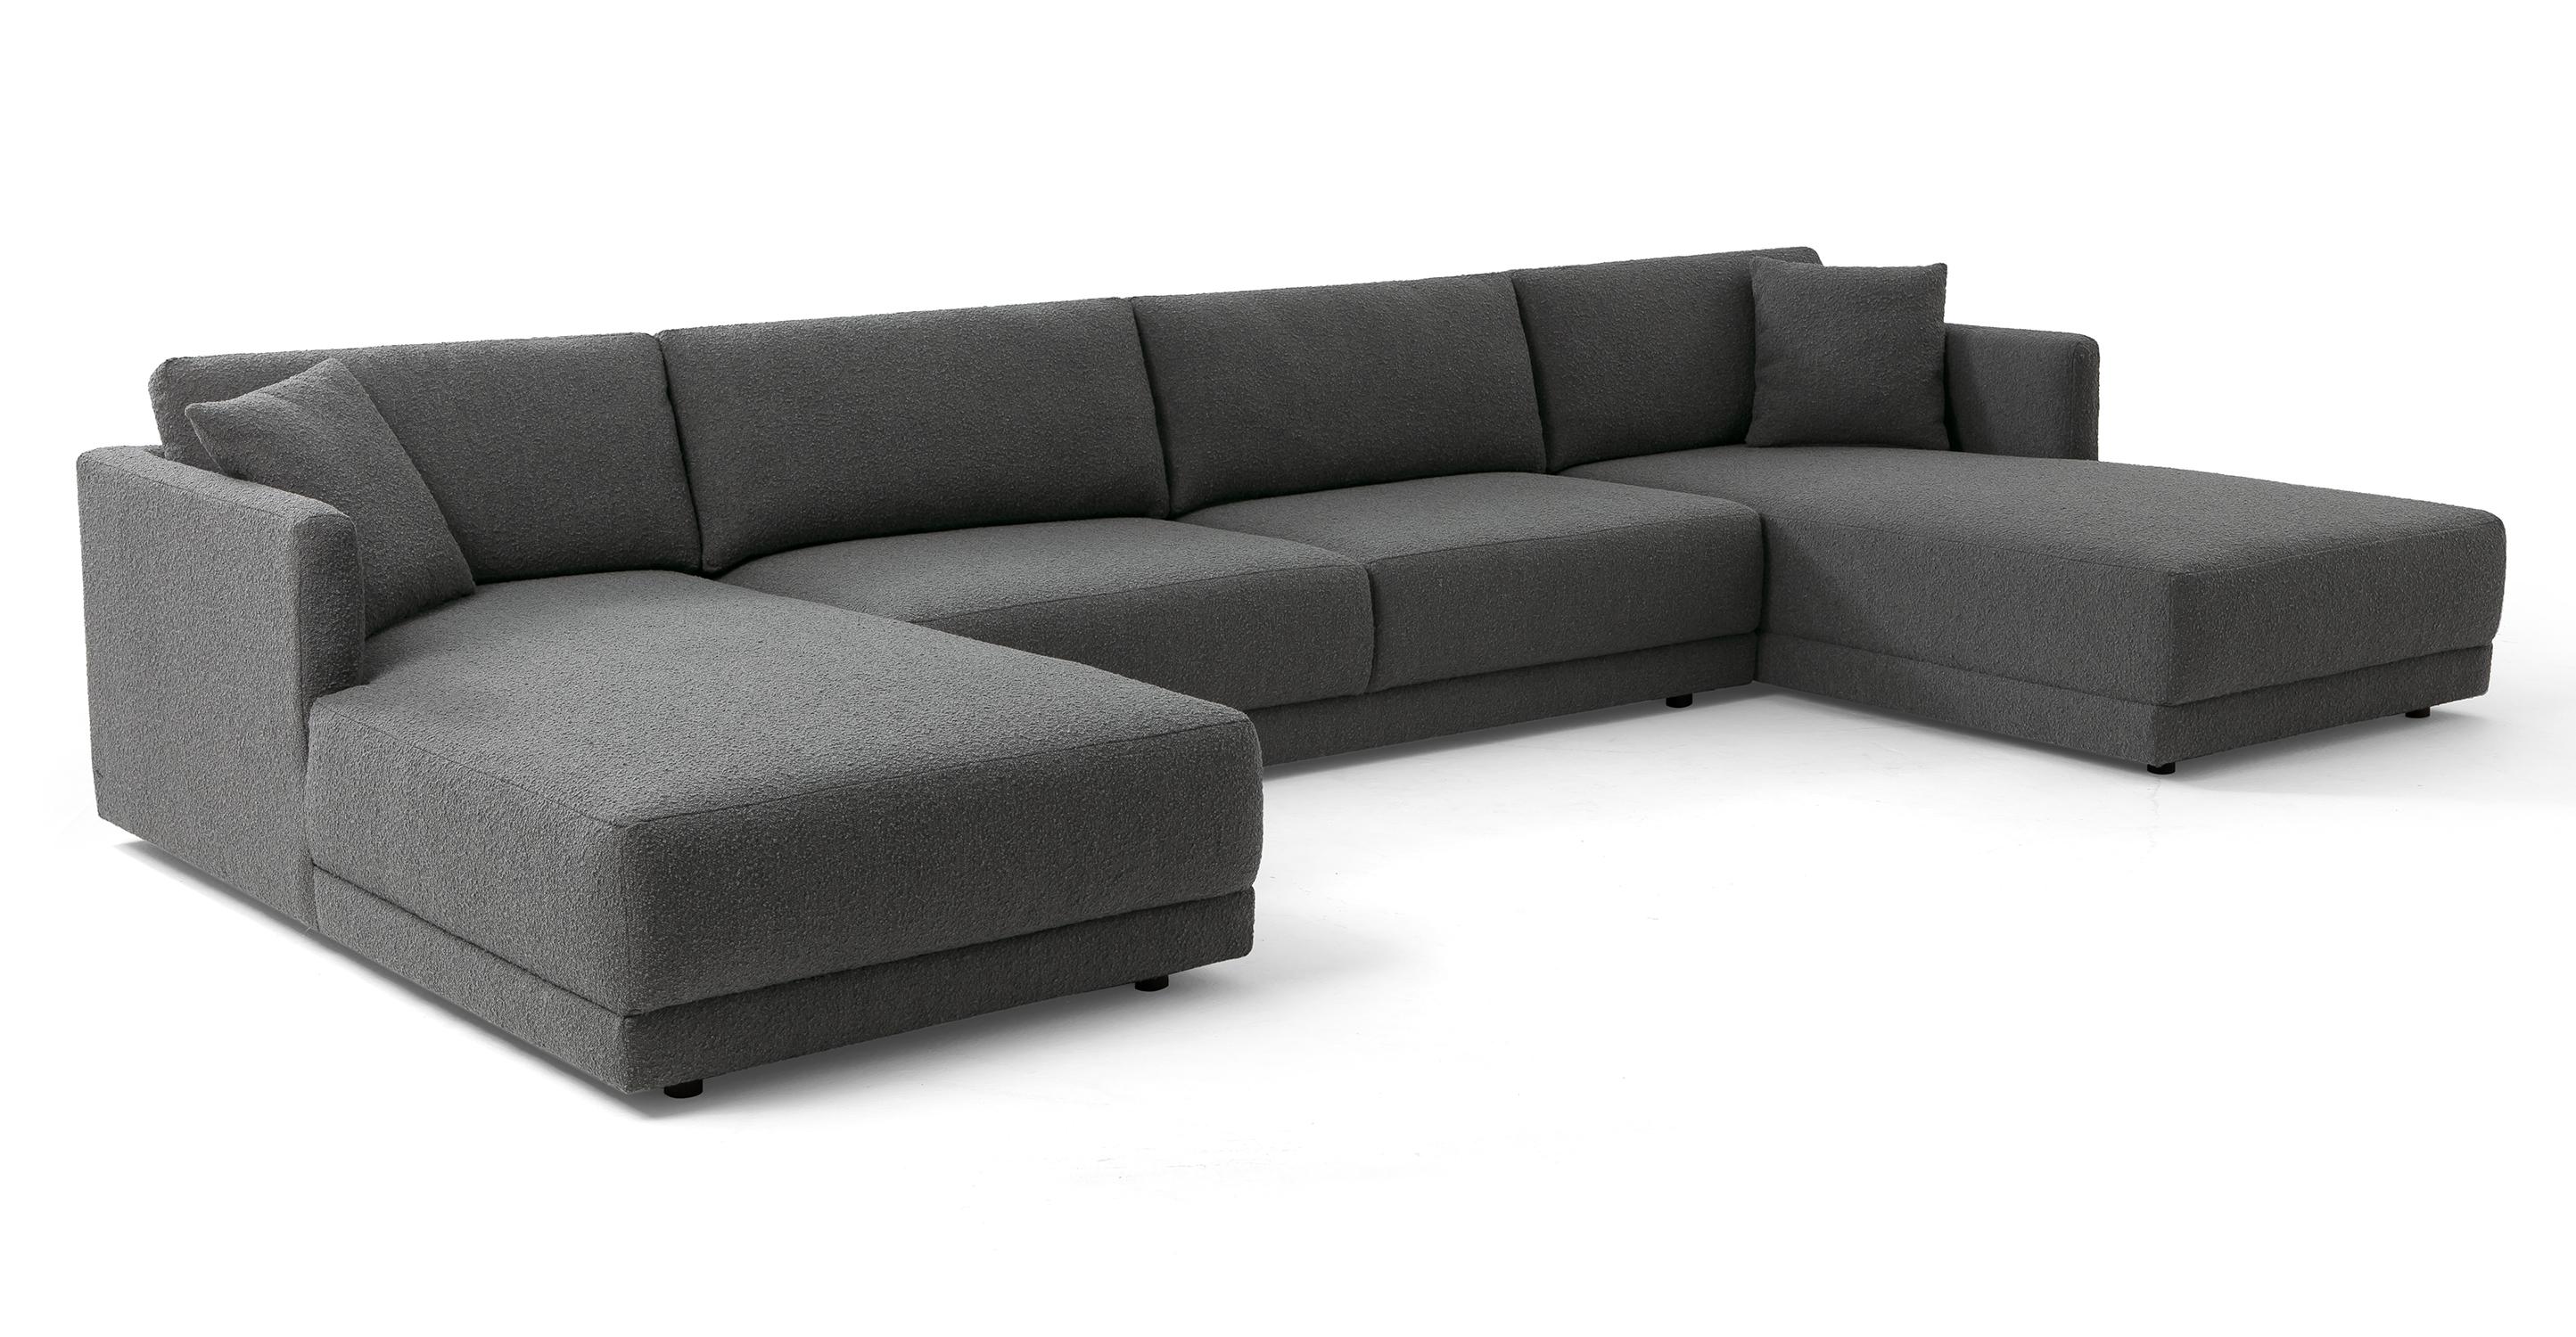 "Domus 155"" 3-pc U-Chaise Sofa Sectional, Gris Boucle"